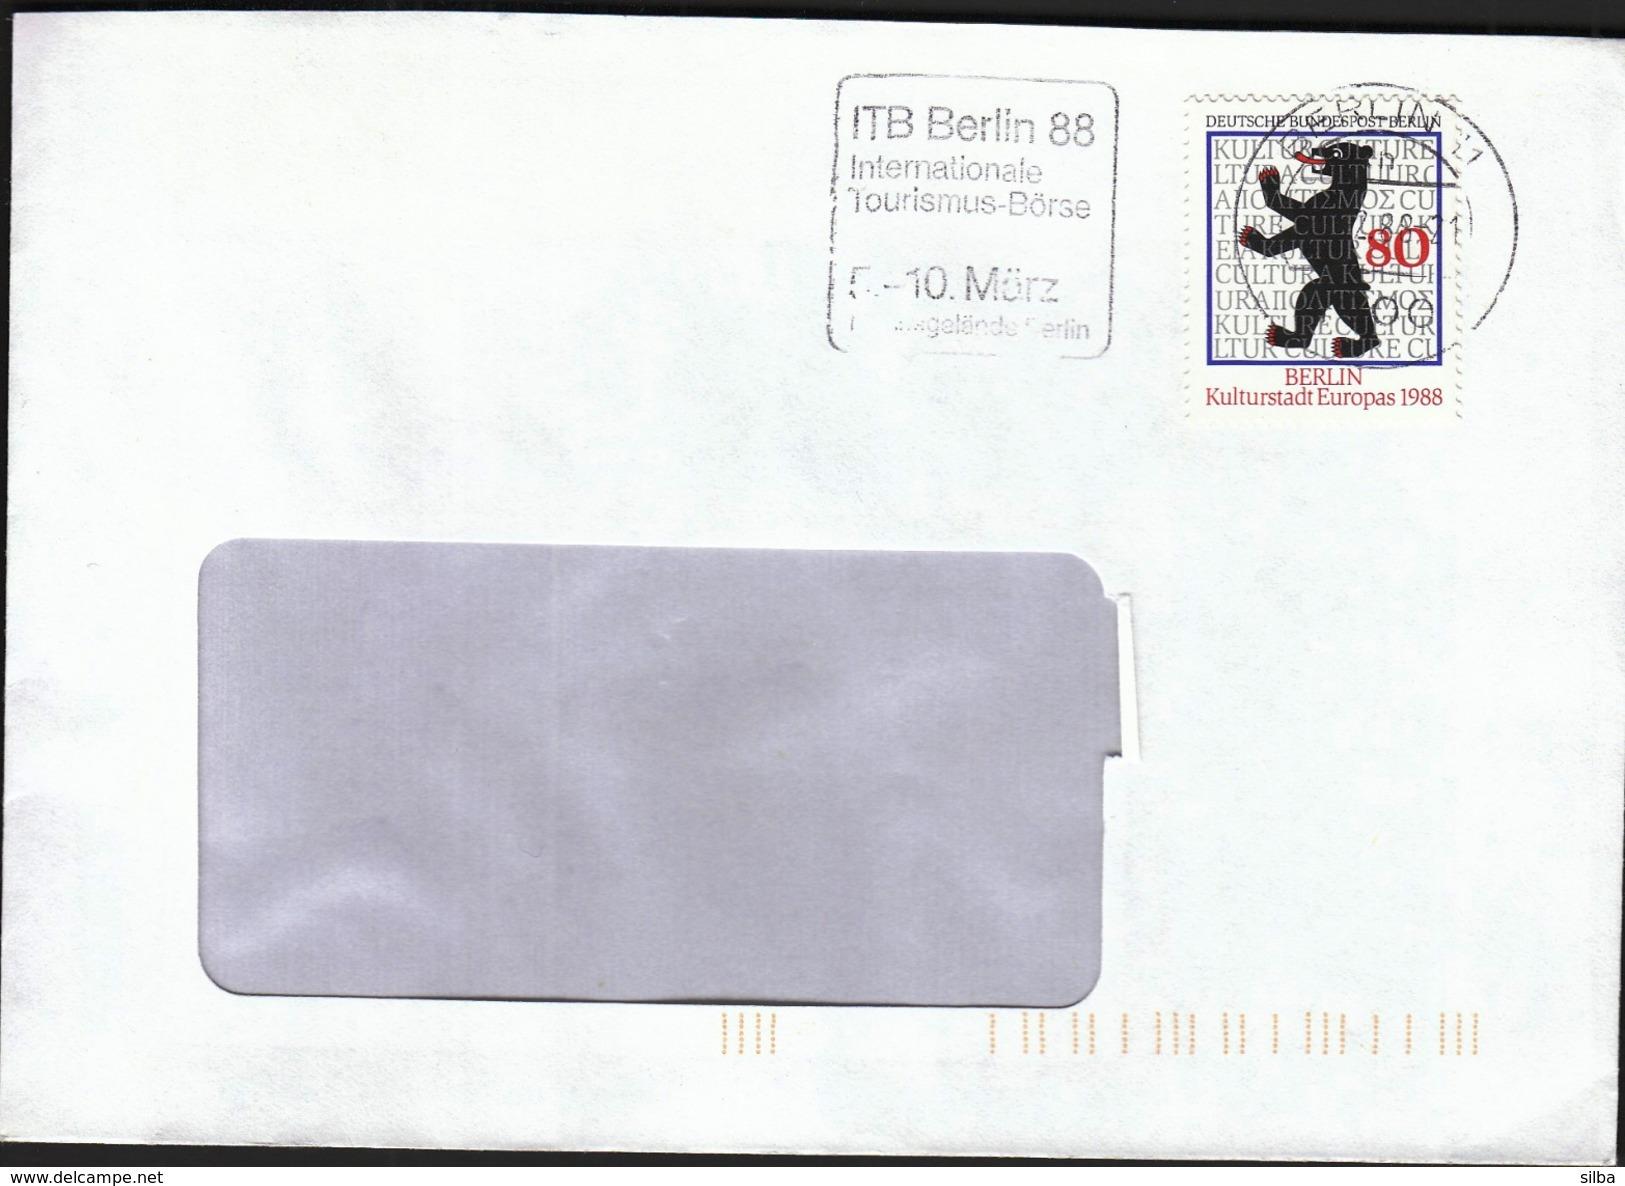 Germany Berlin 1988 / Tourism / ITB Berlin 88 / Internationale Tourismus Börse / Machine Stamp - Holidays & Tourism